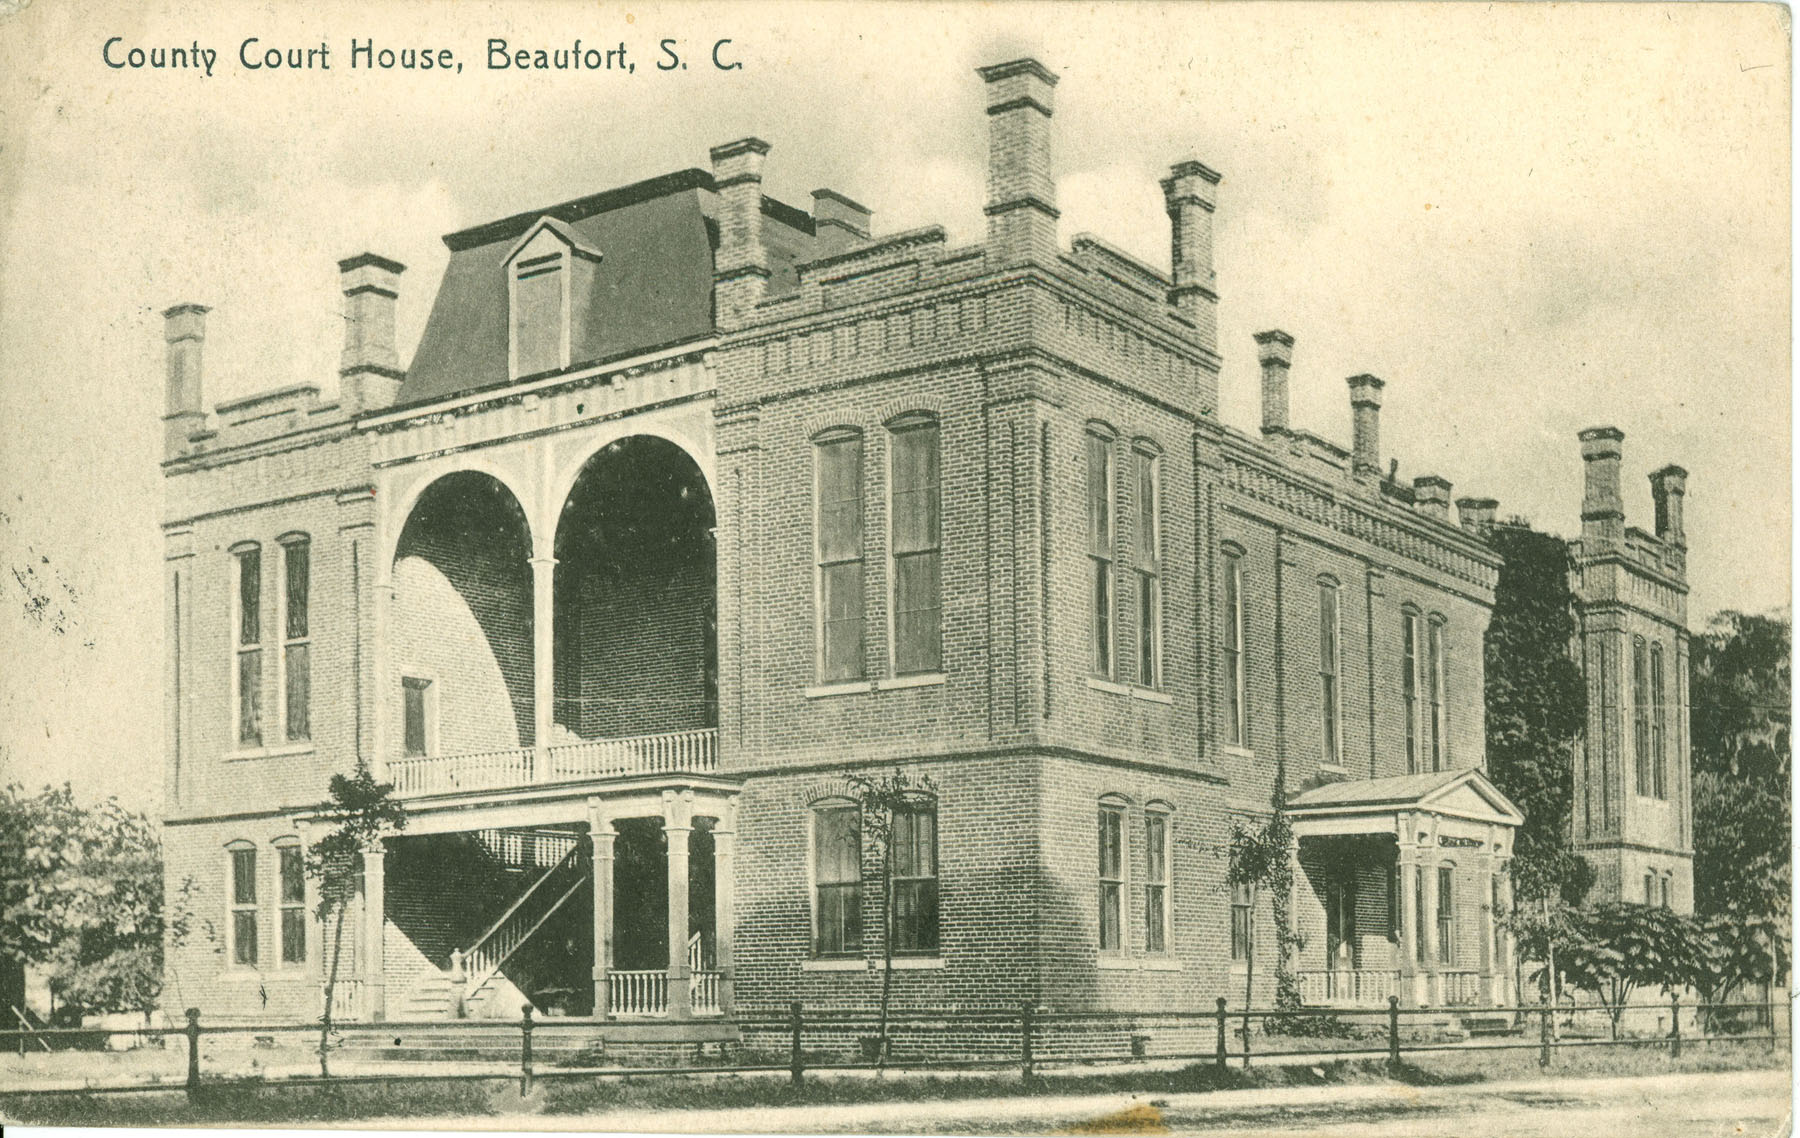 County Court House, Beaufort, South Carolina